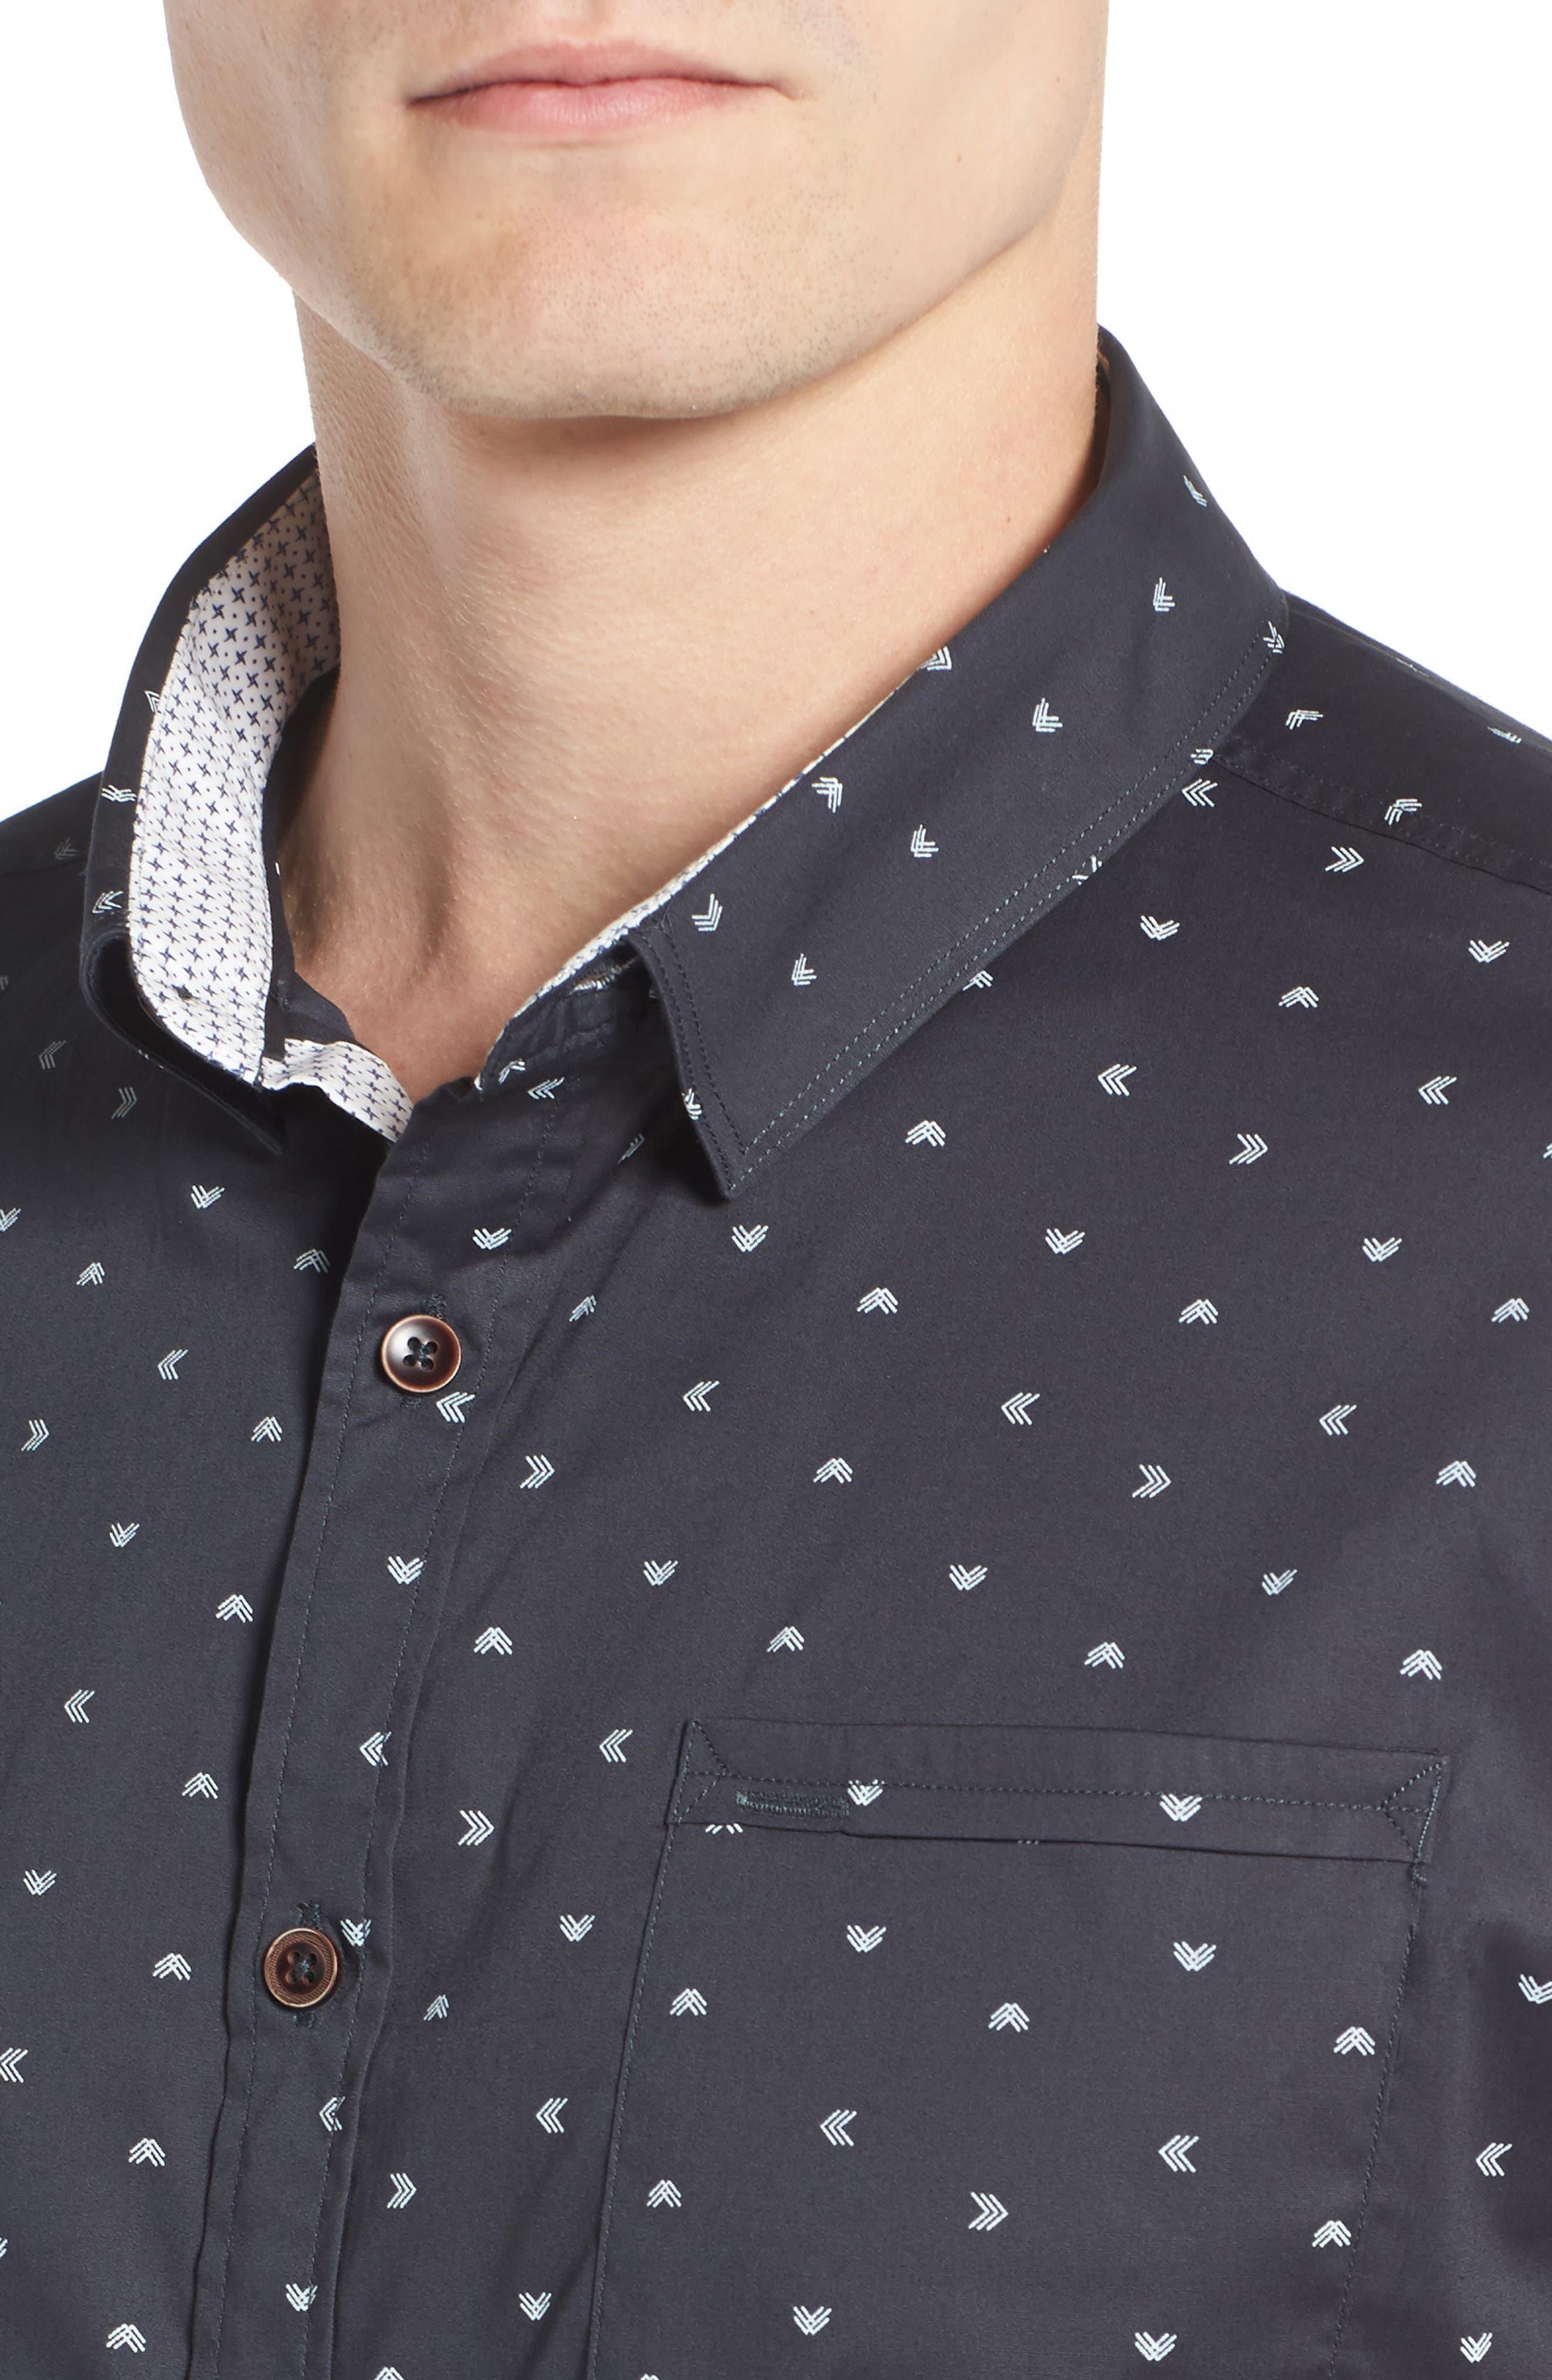 Rising Water Print Woven Shirt,                             Alternate thumbnail 4, color,                             Charcoal